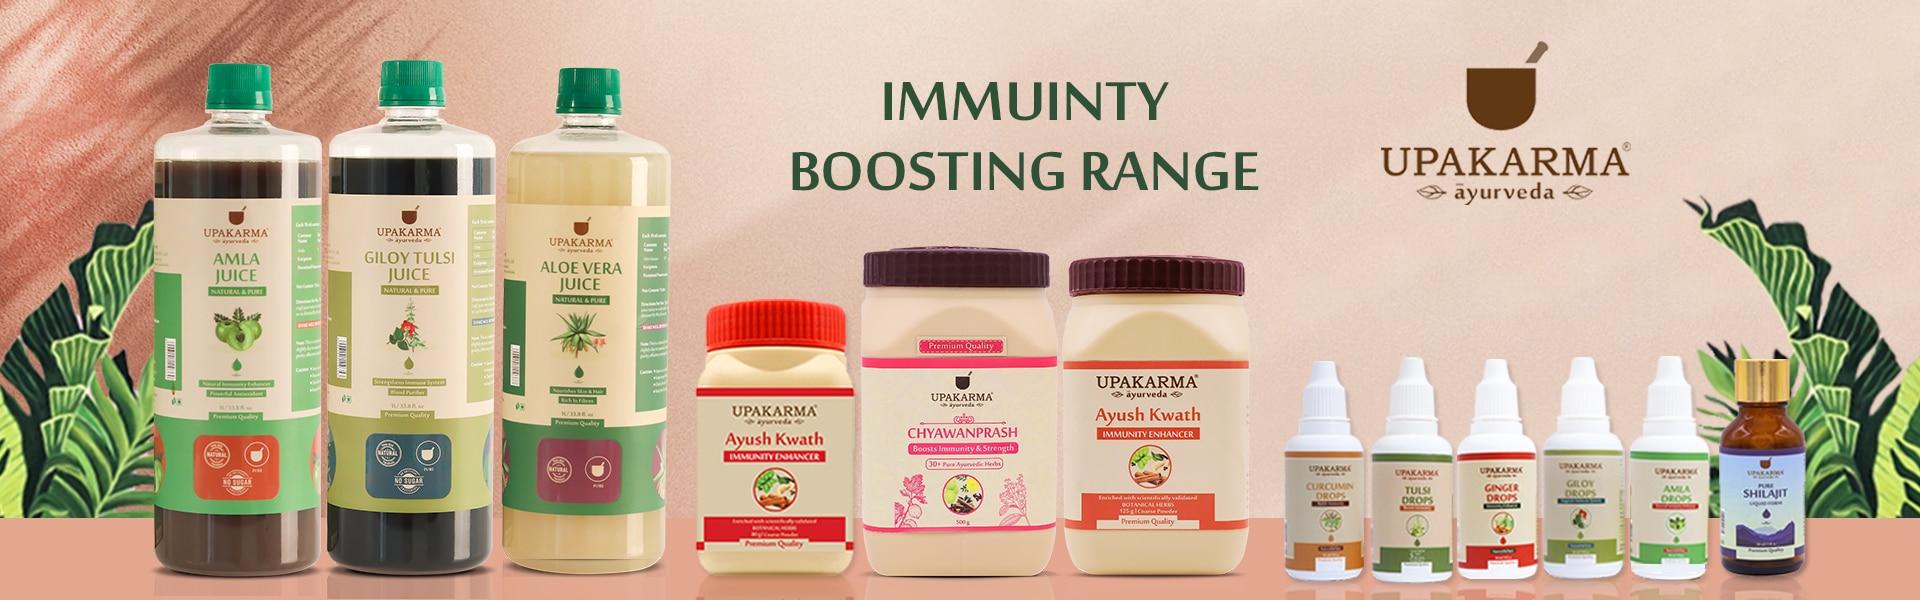 immunity booster, upakarma ayurveda